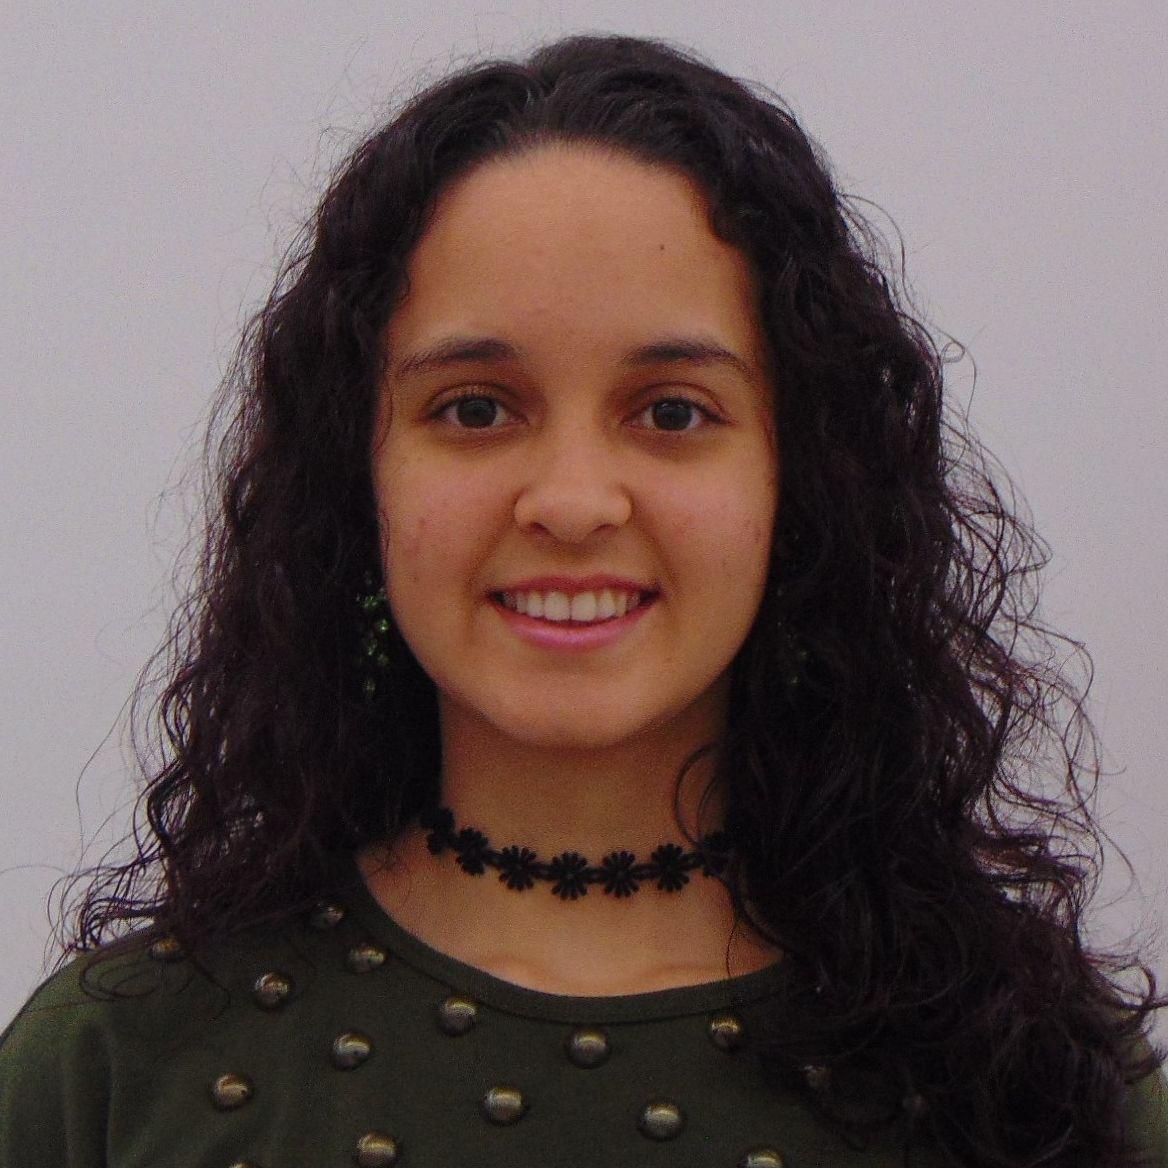 Pimienta Ramirez